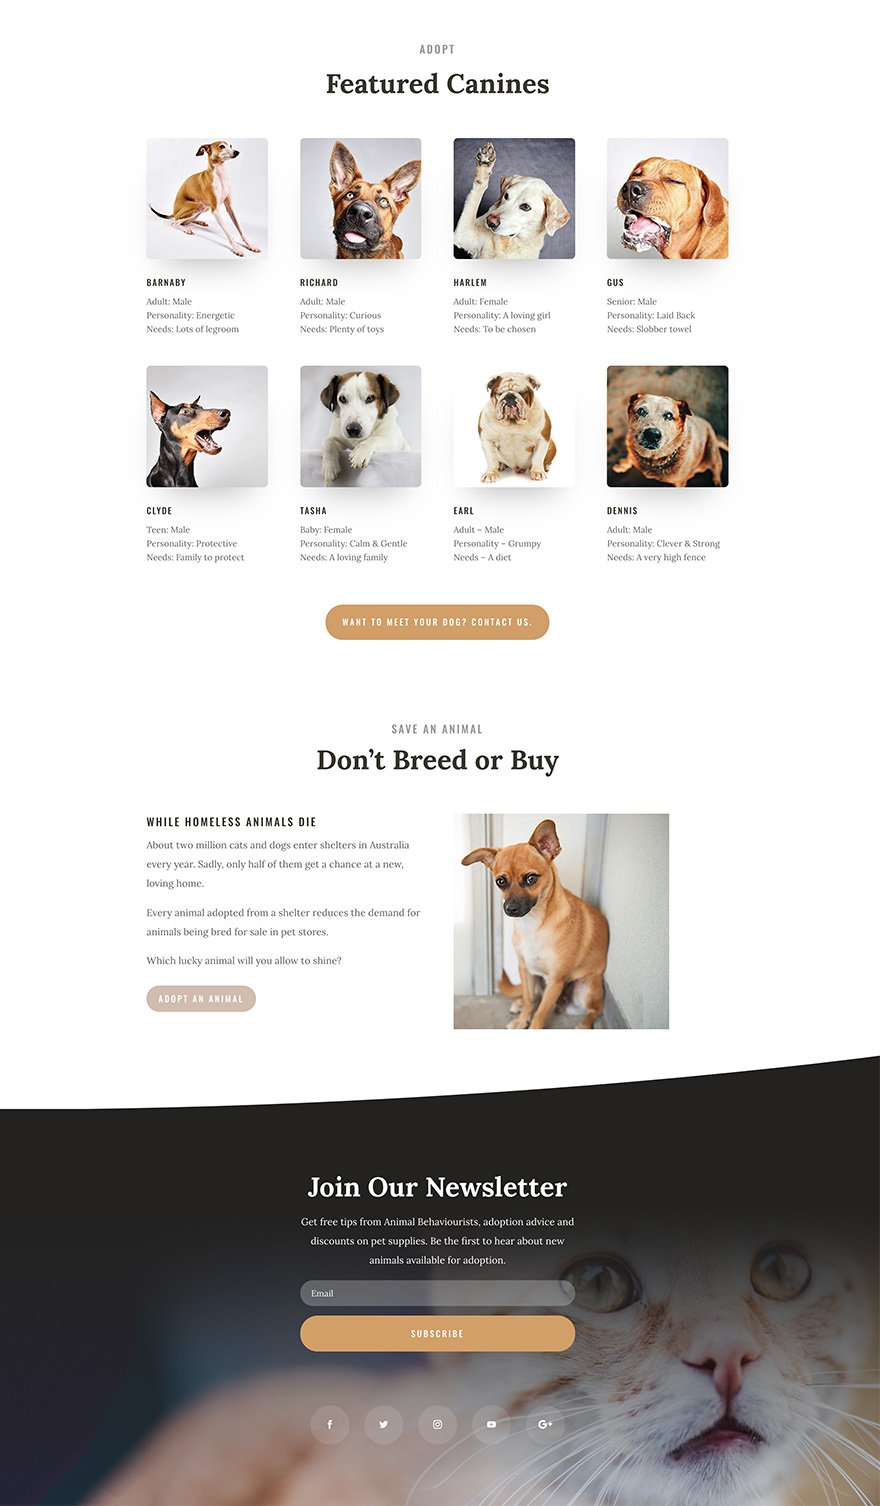 Conversion optimised website design for animal adoption charity